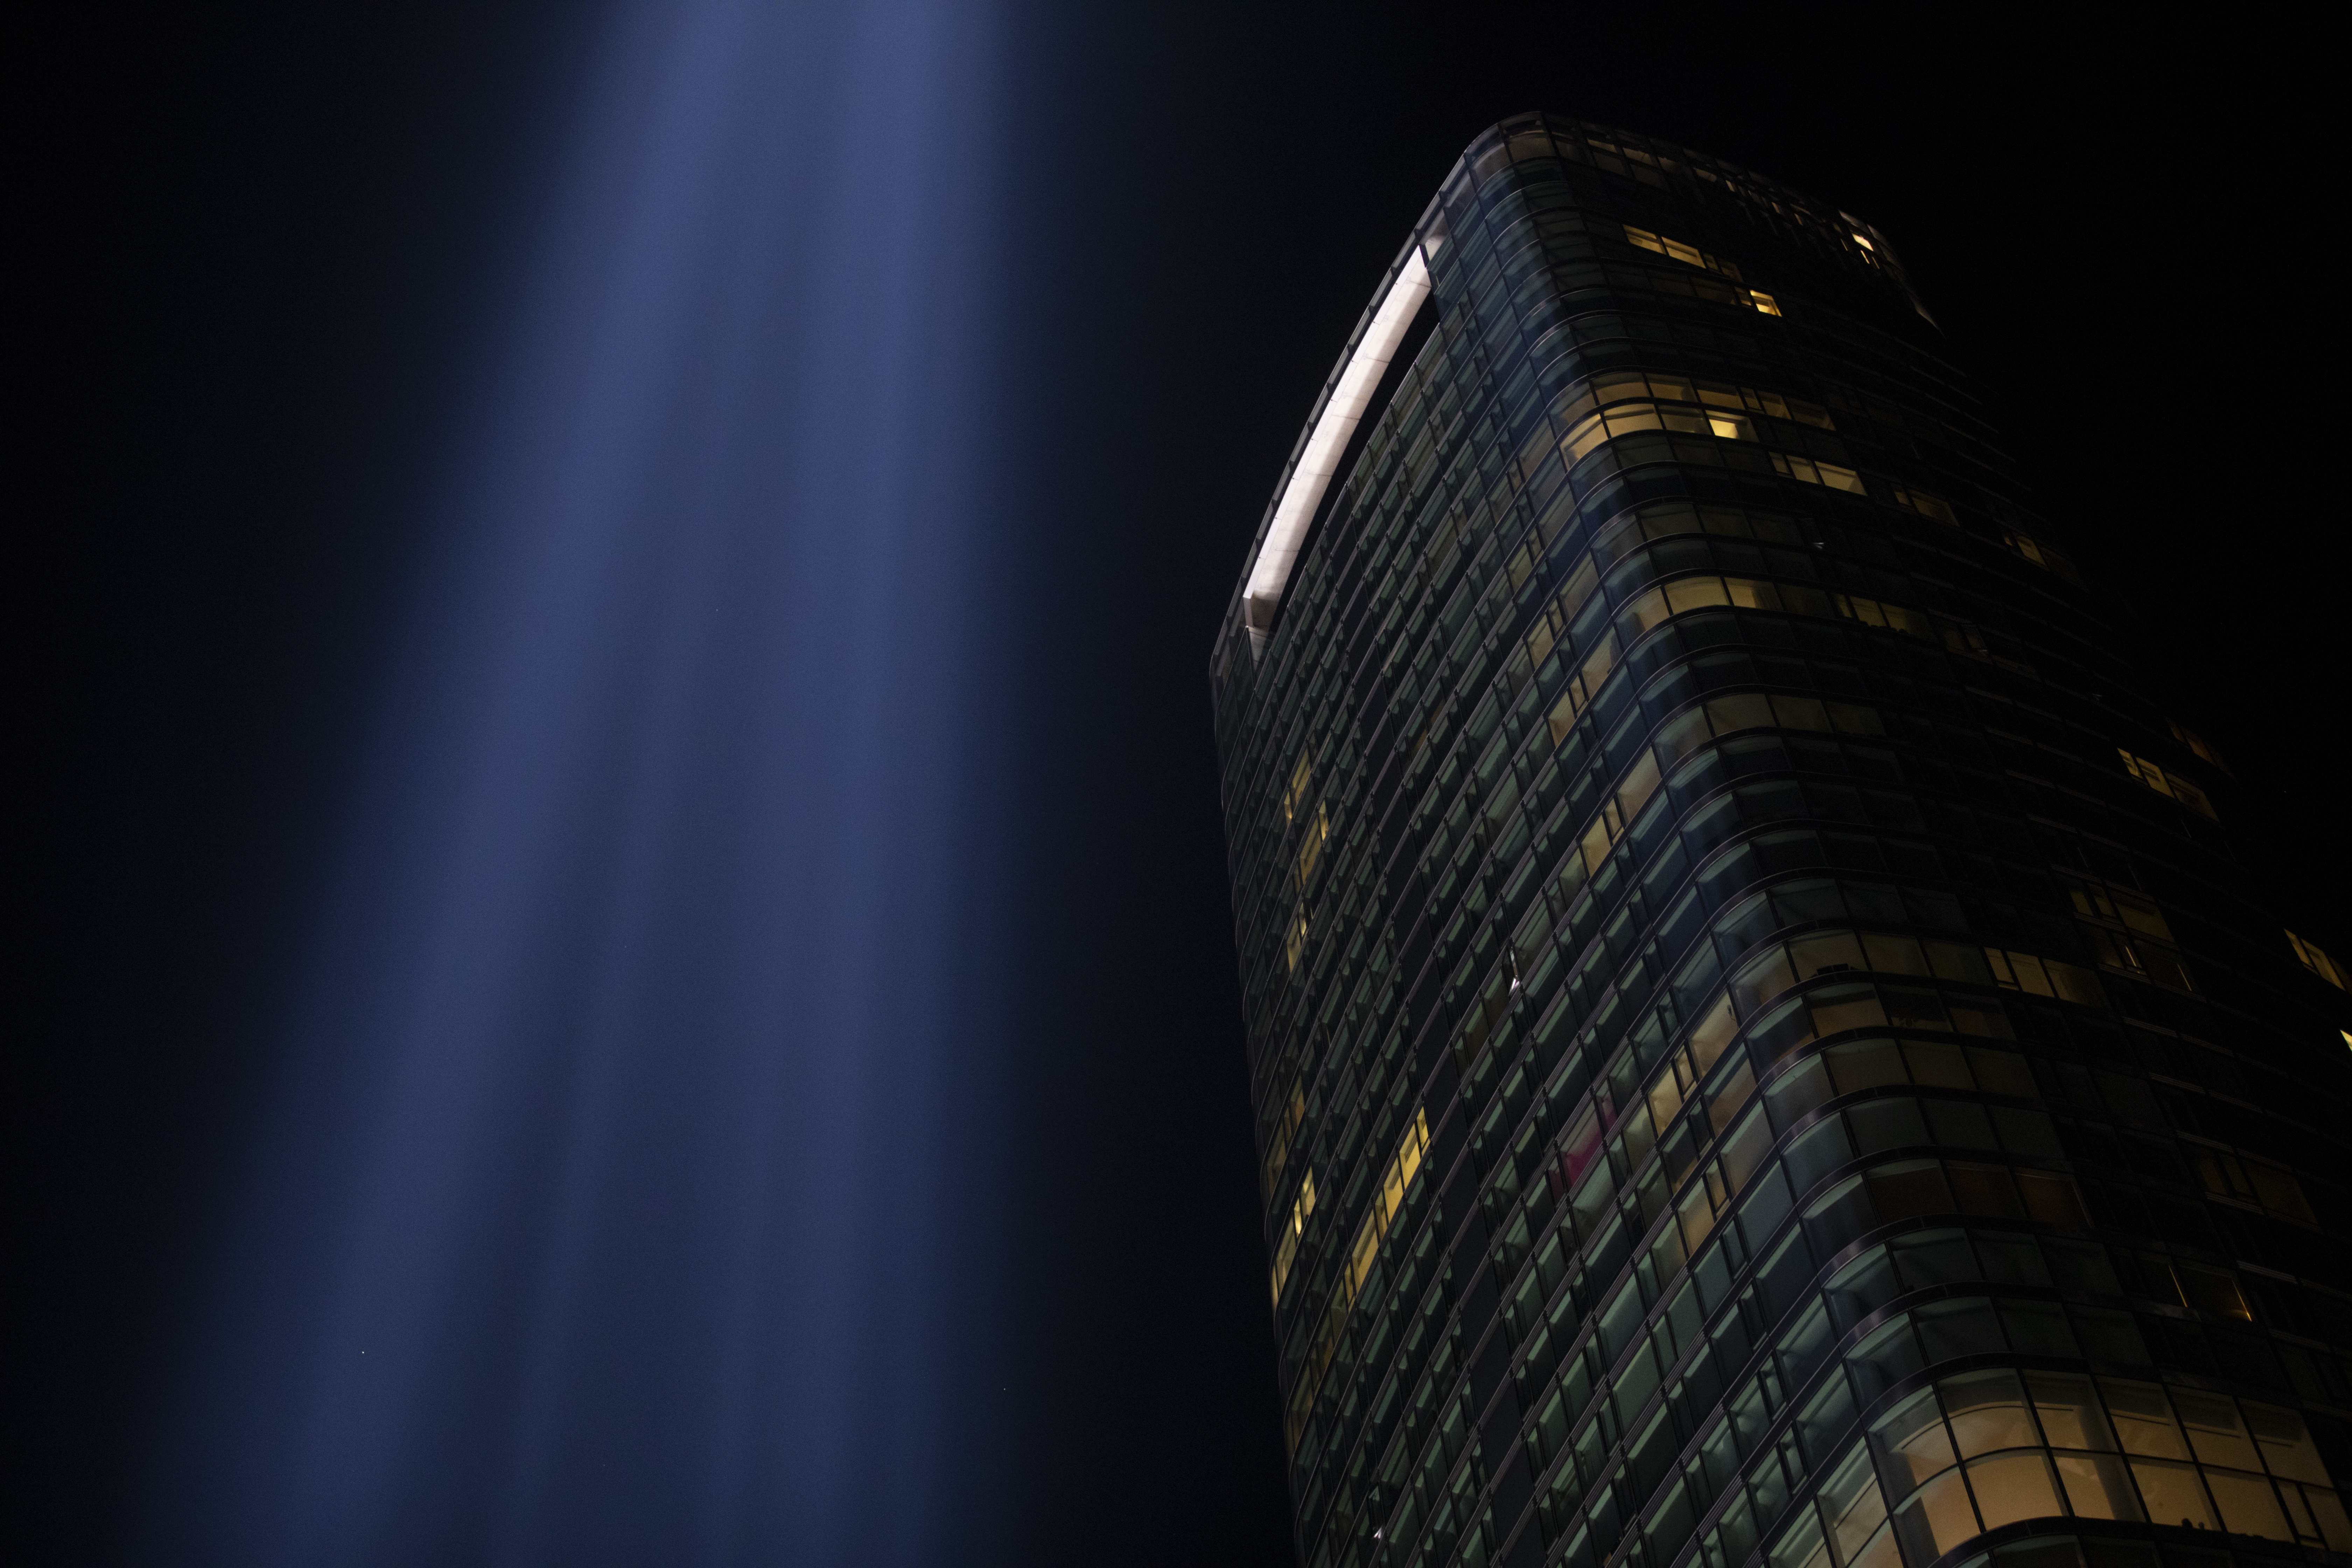 9/11 Tribute in Light Memorial  in New York City Luke Franke